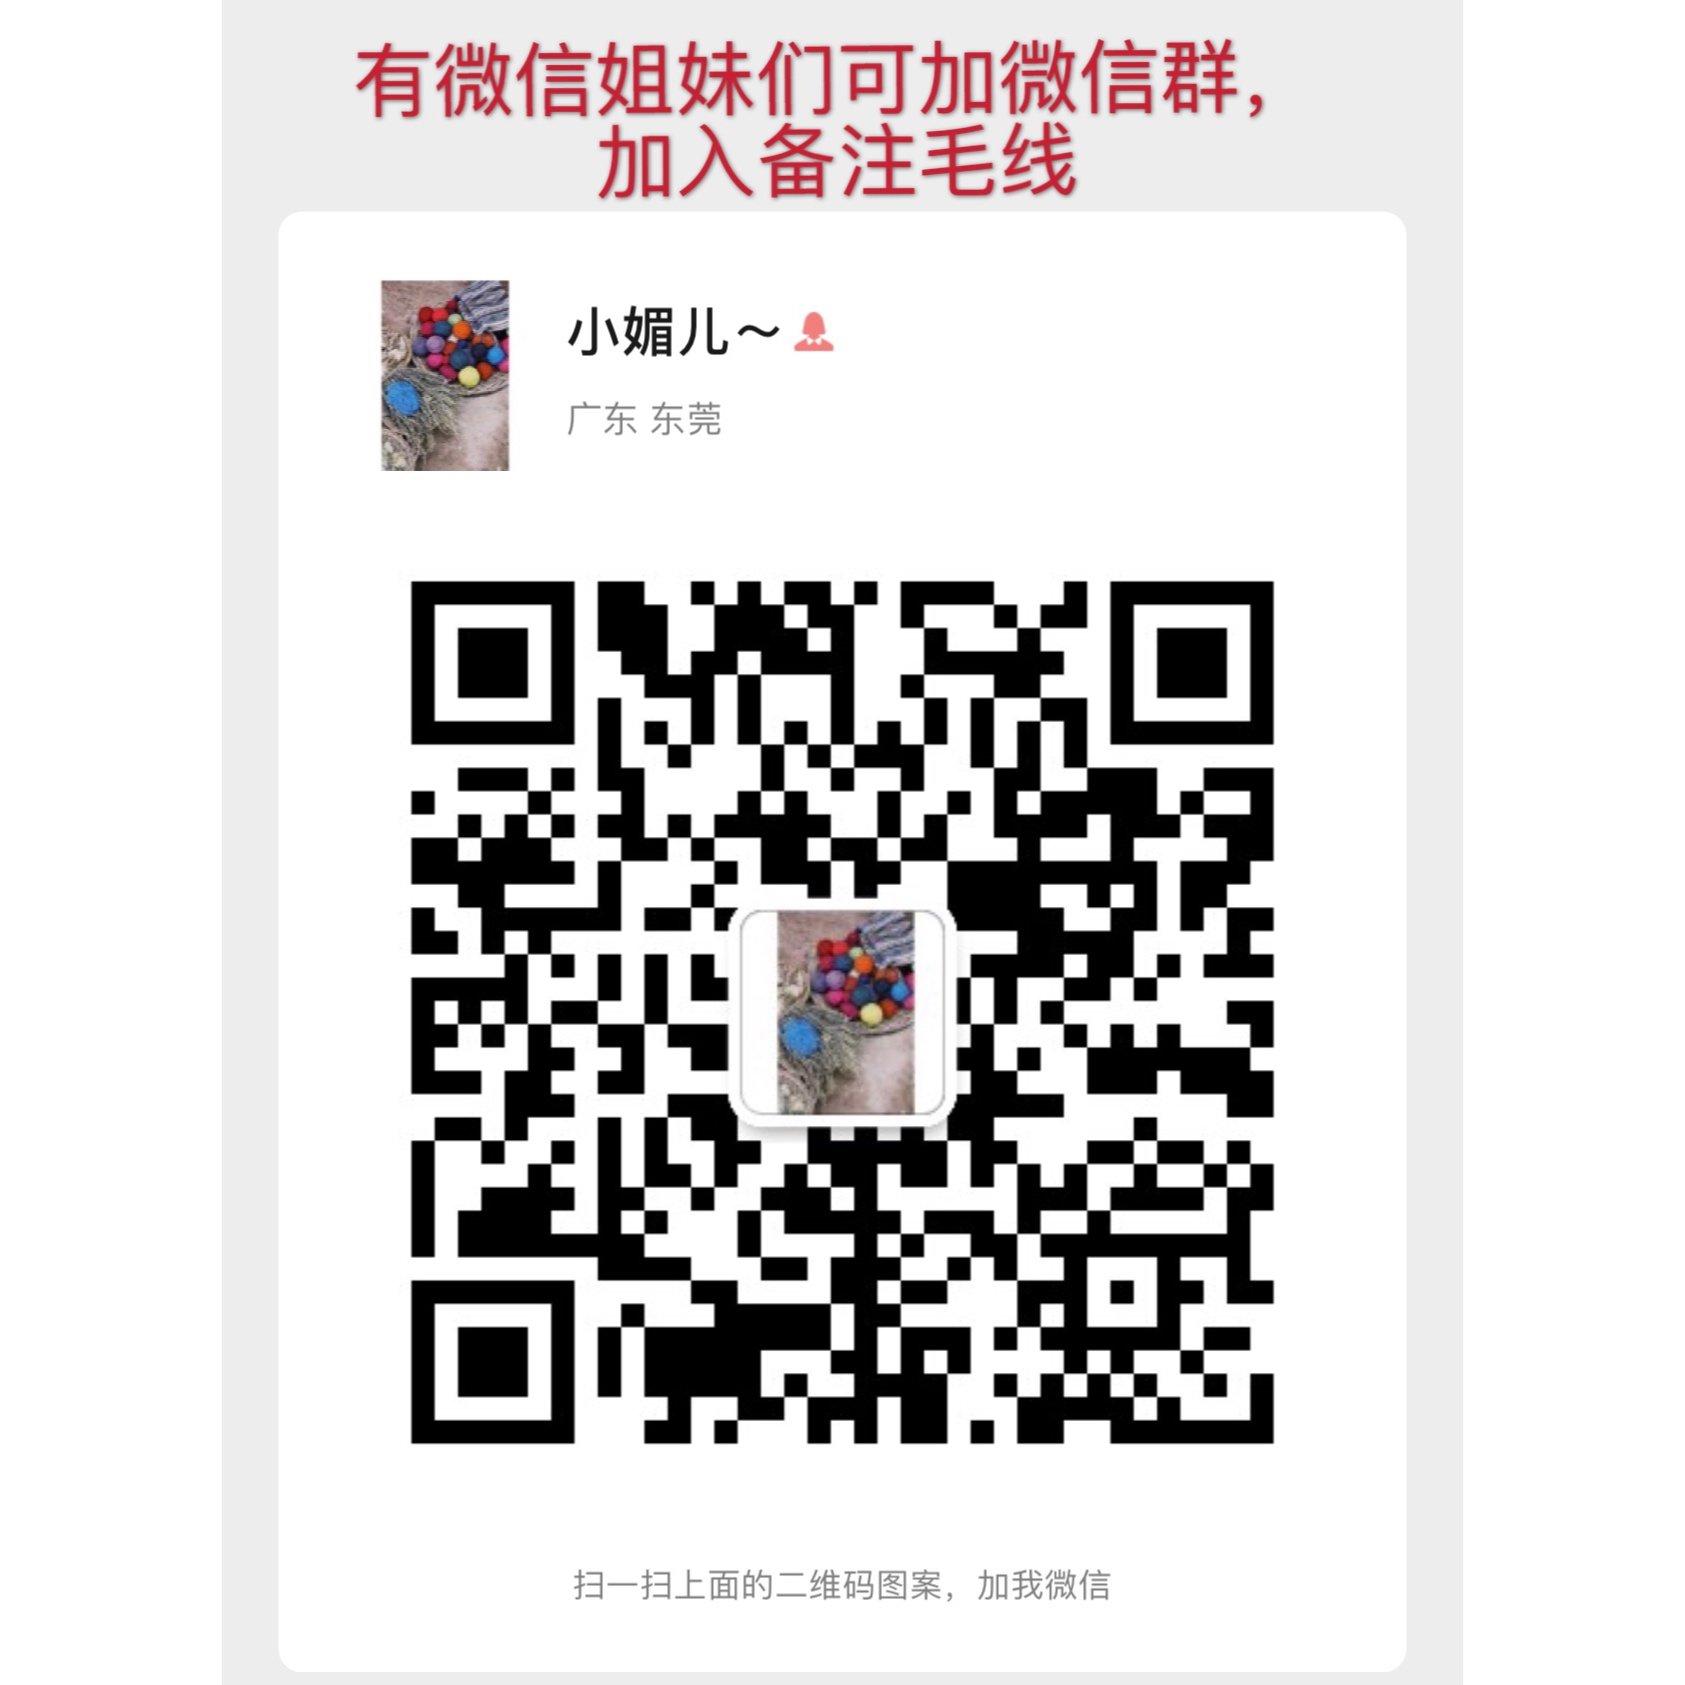 IMG_6333(20200311-125356).JPG